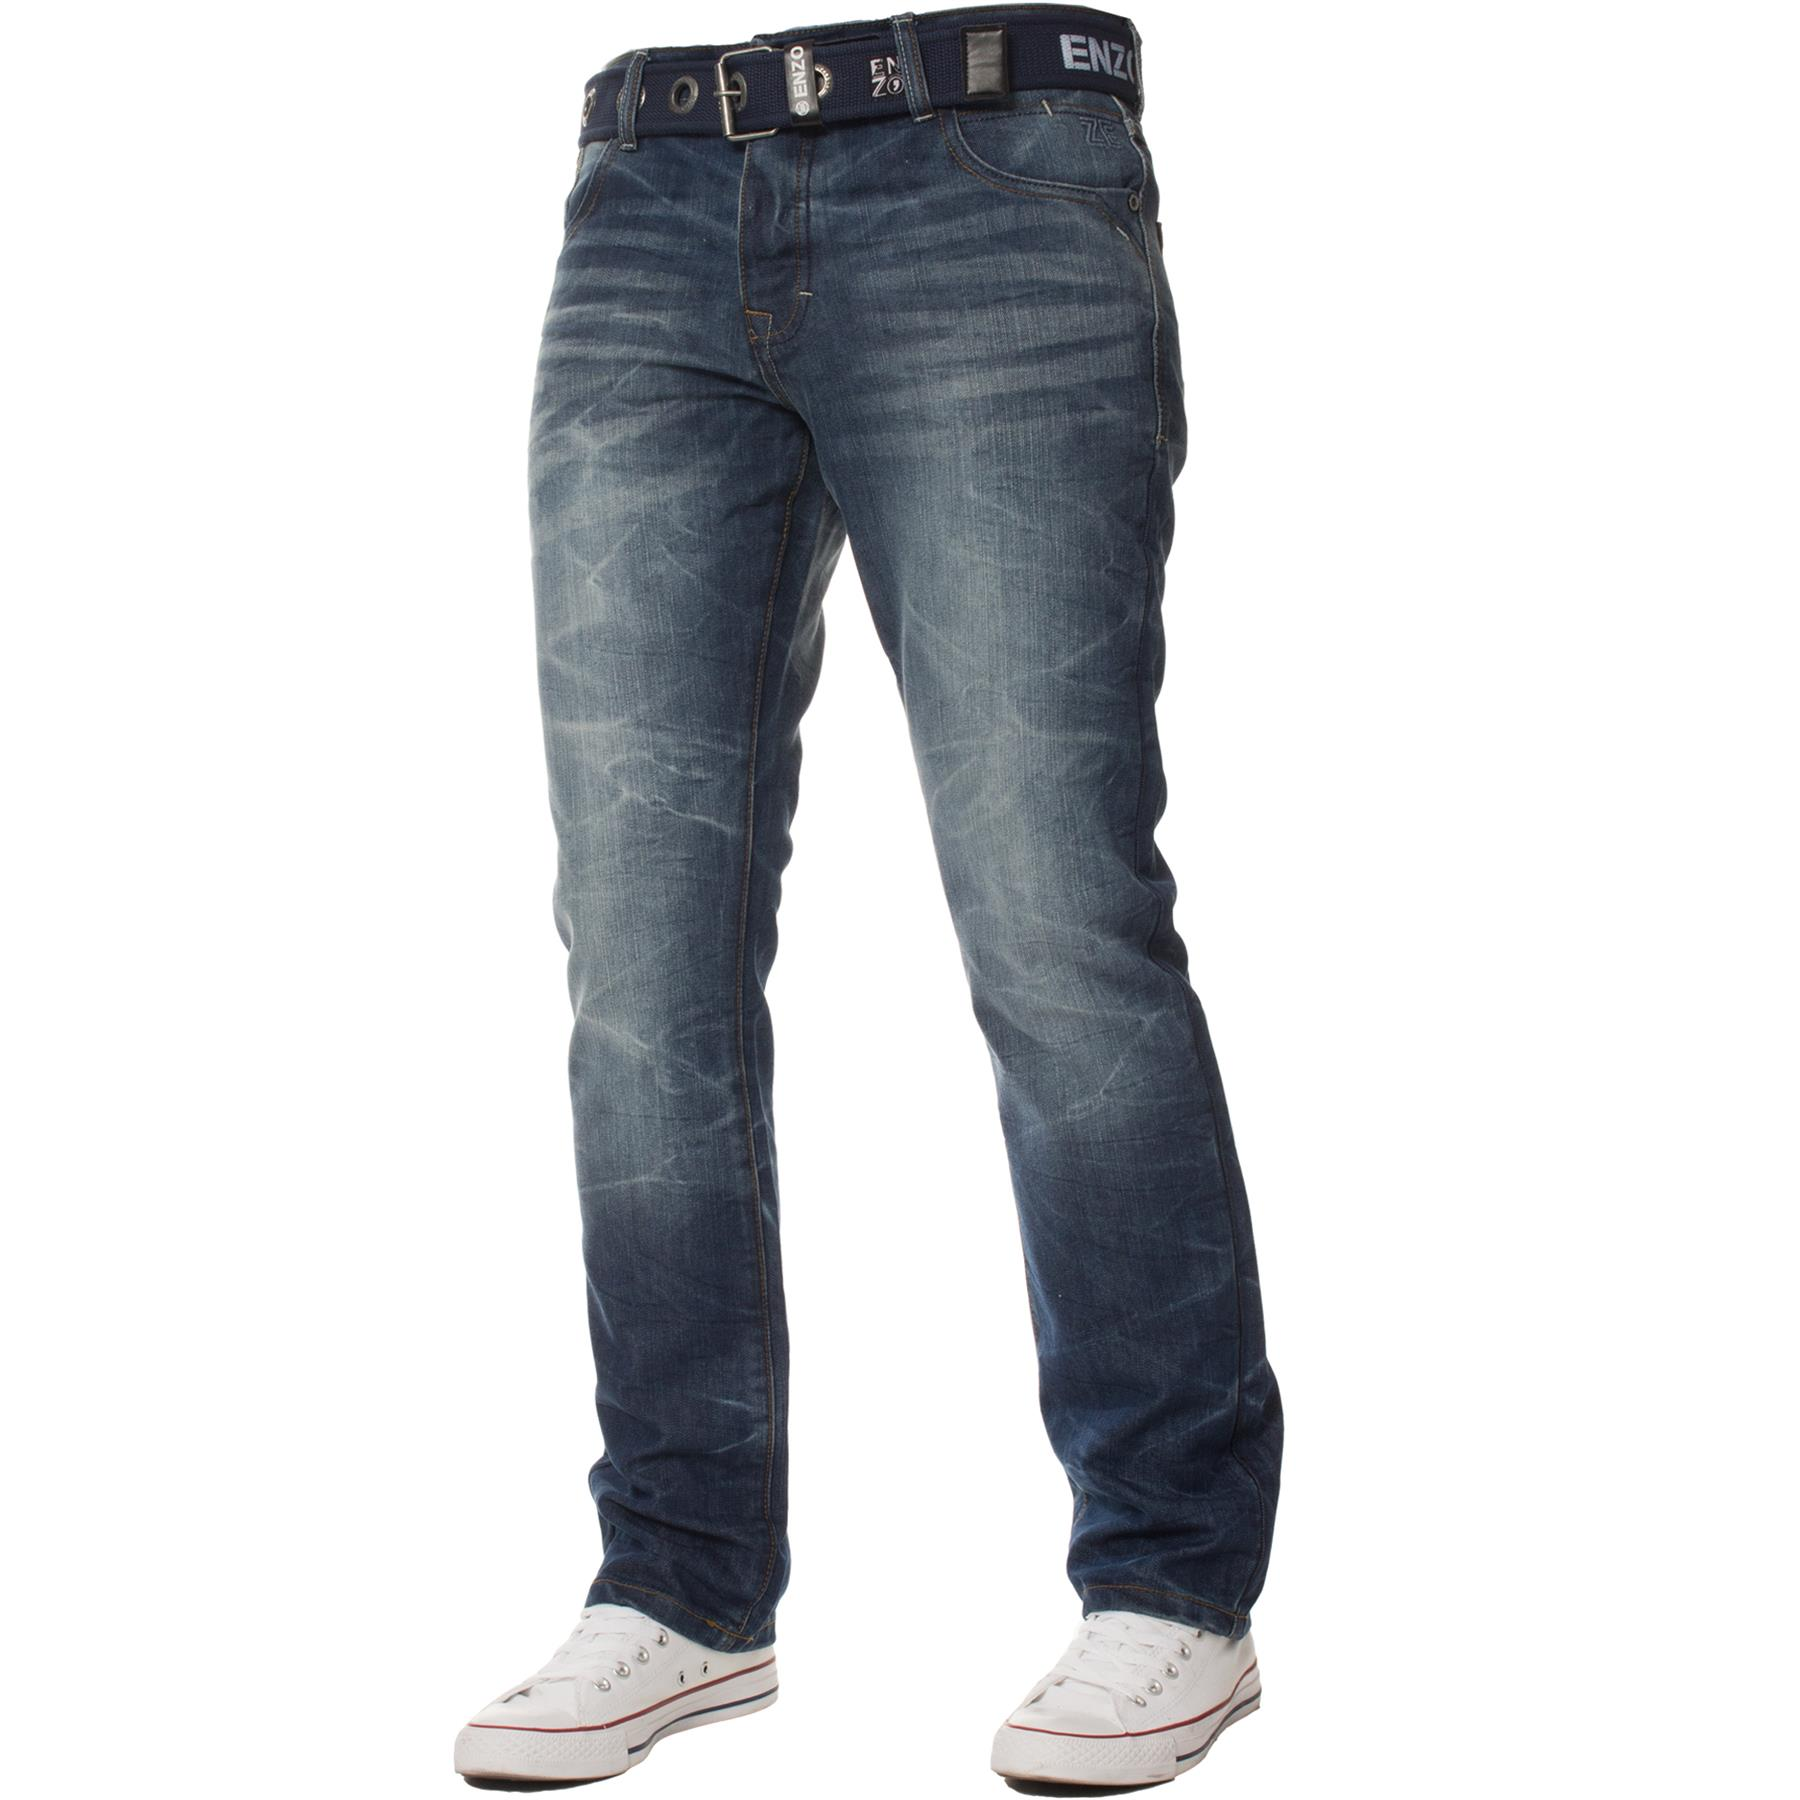 Enzo-Mens-Big-Tall-Jeans-Leg-King-Size-Denim-Pants-Chino-Trousers-Pants-44-034-60-034 thumbnail 84